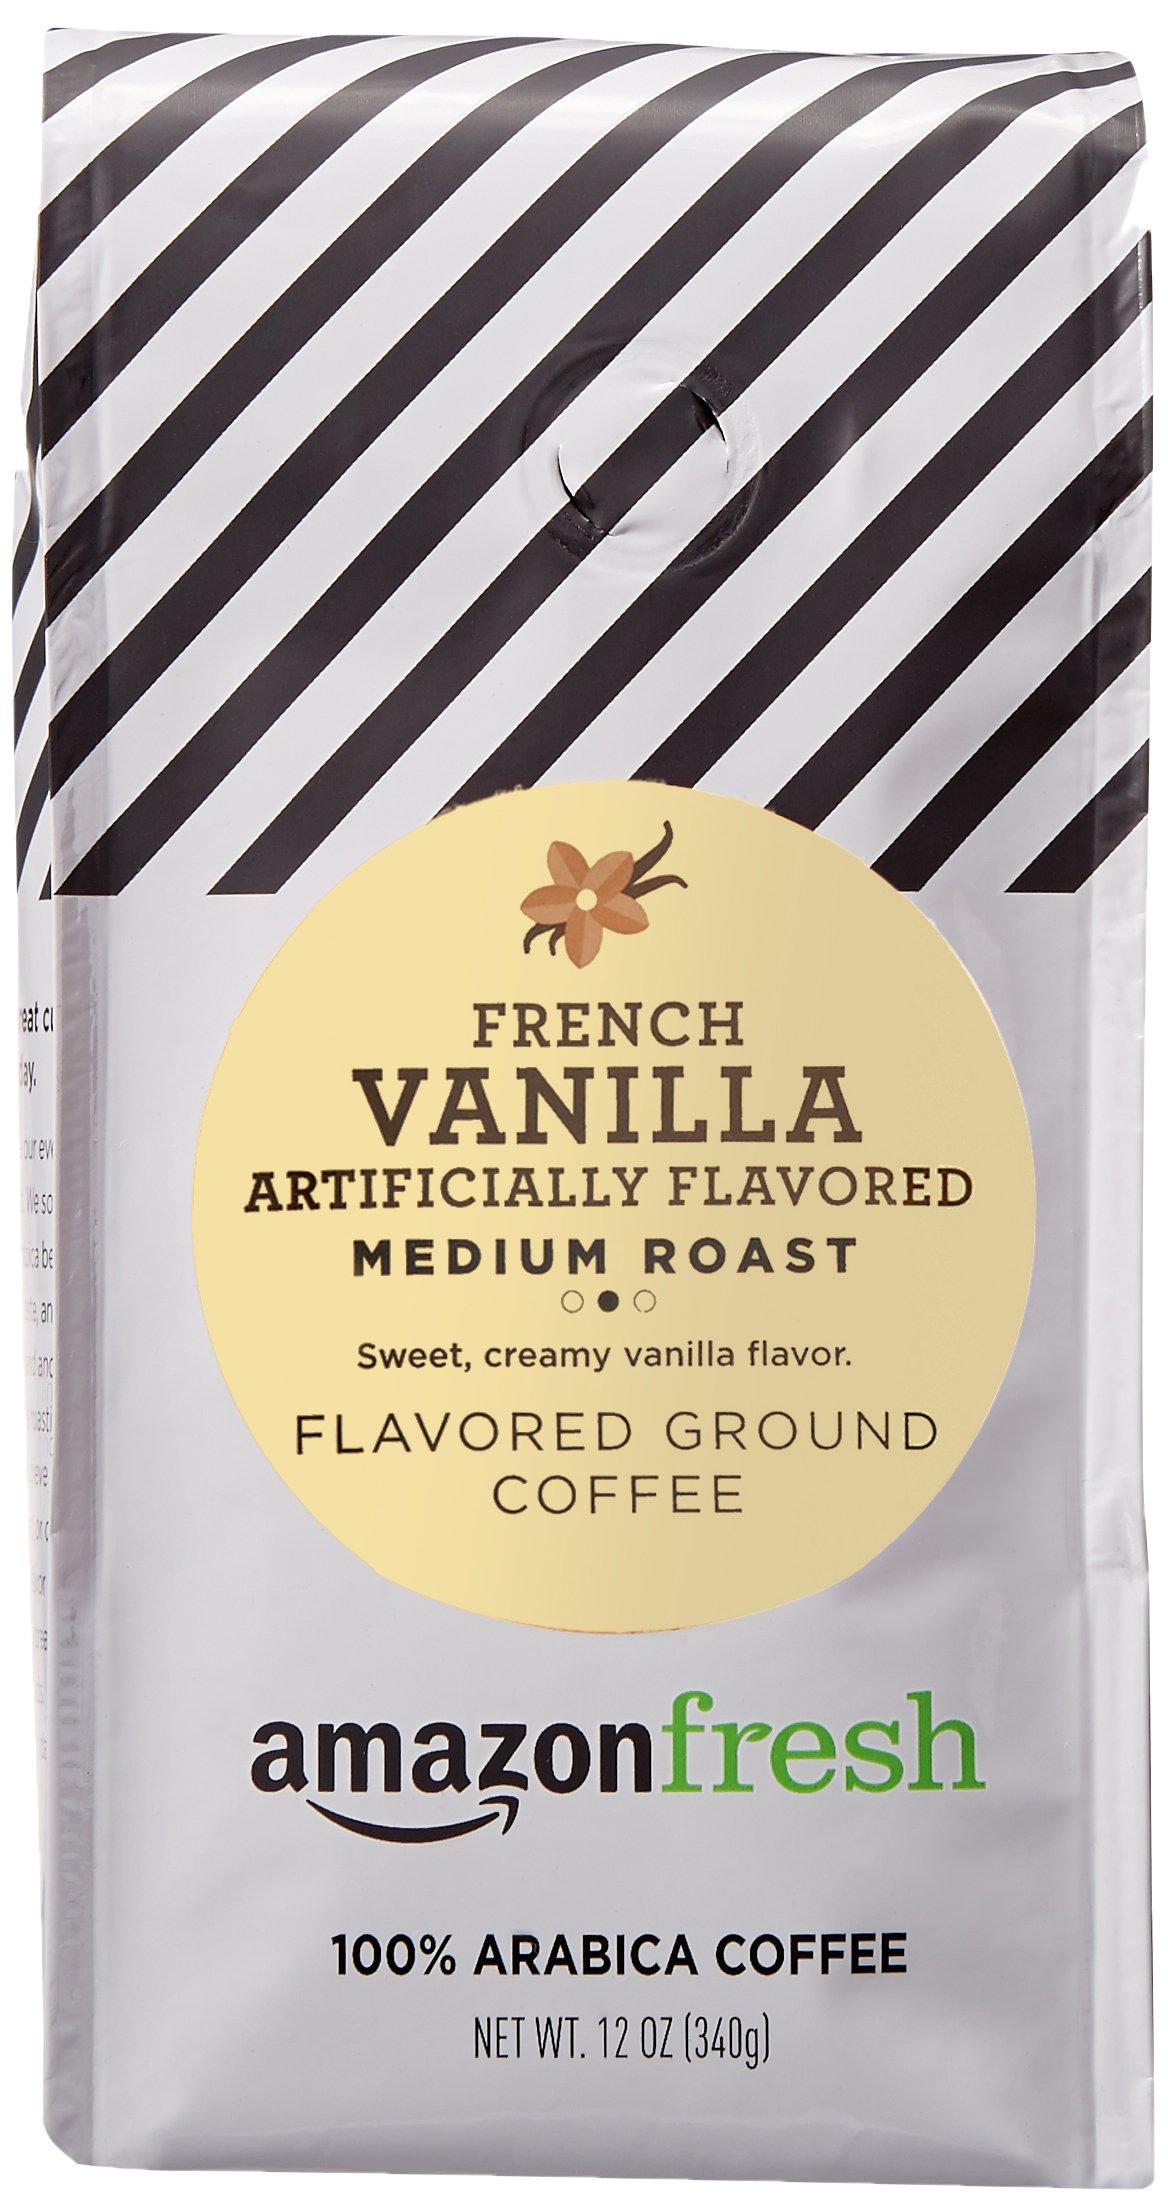 AmazonFresh French Vanilla Flavored Coffee